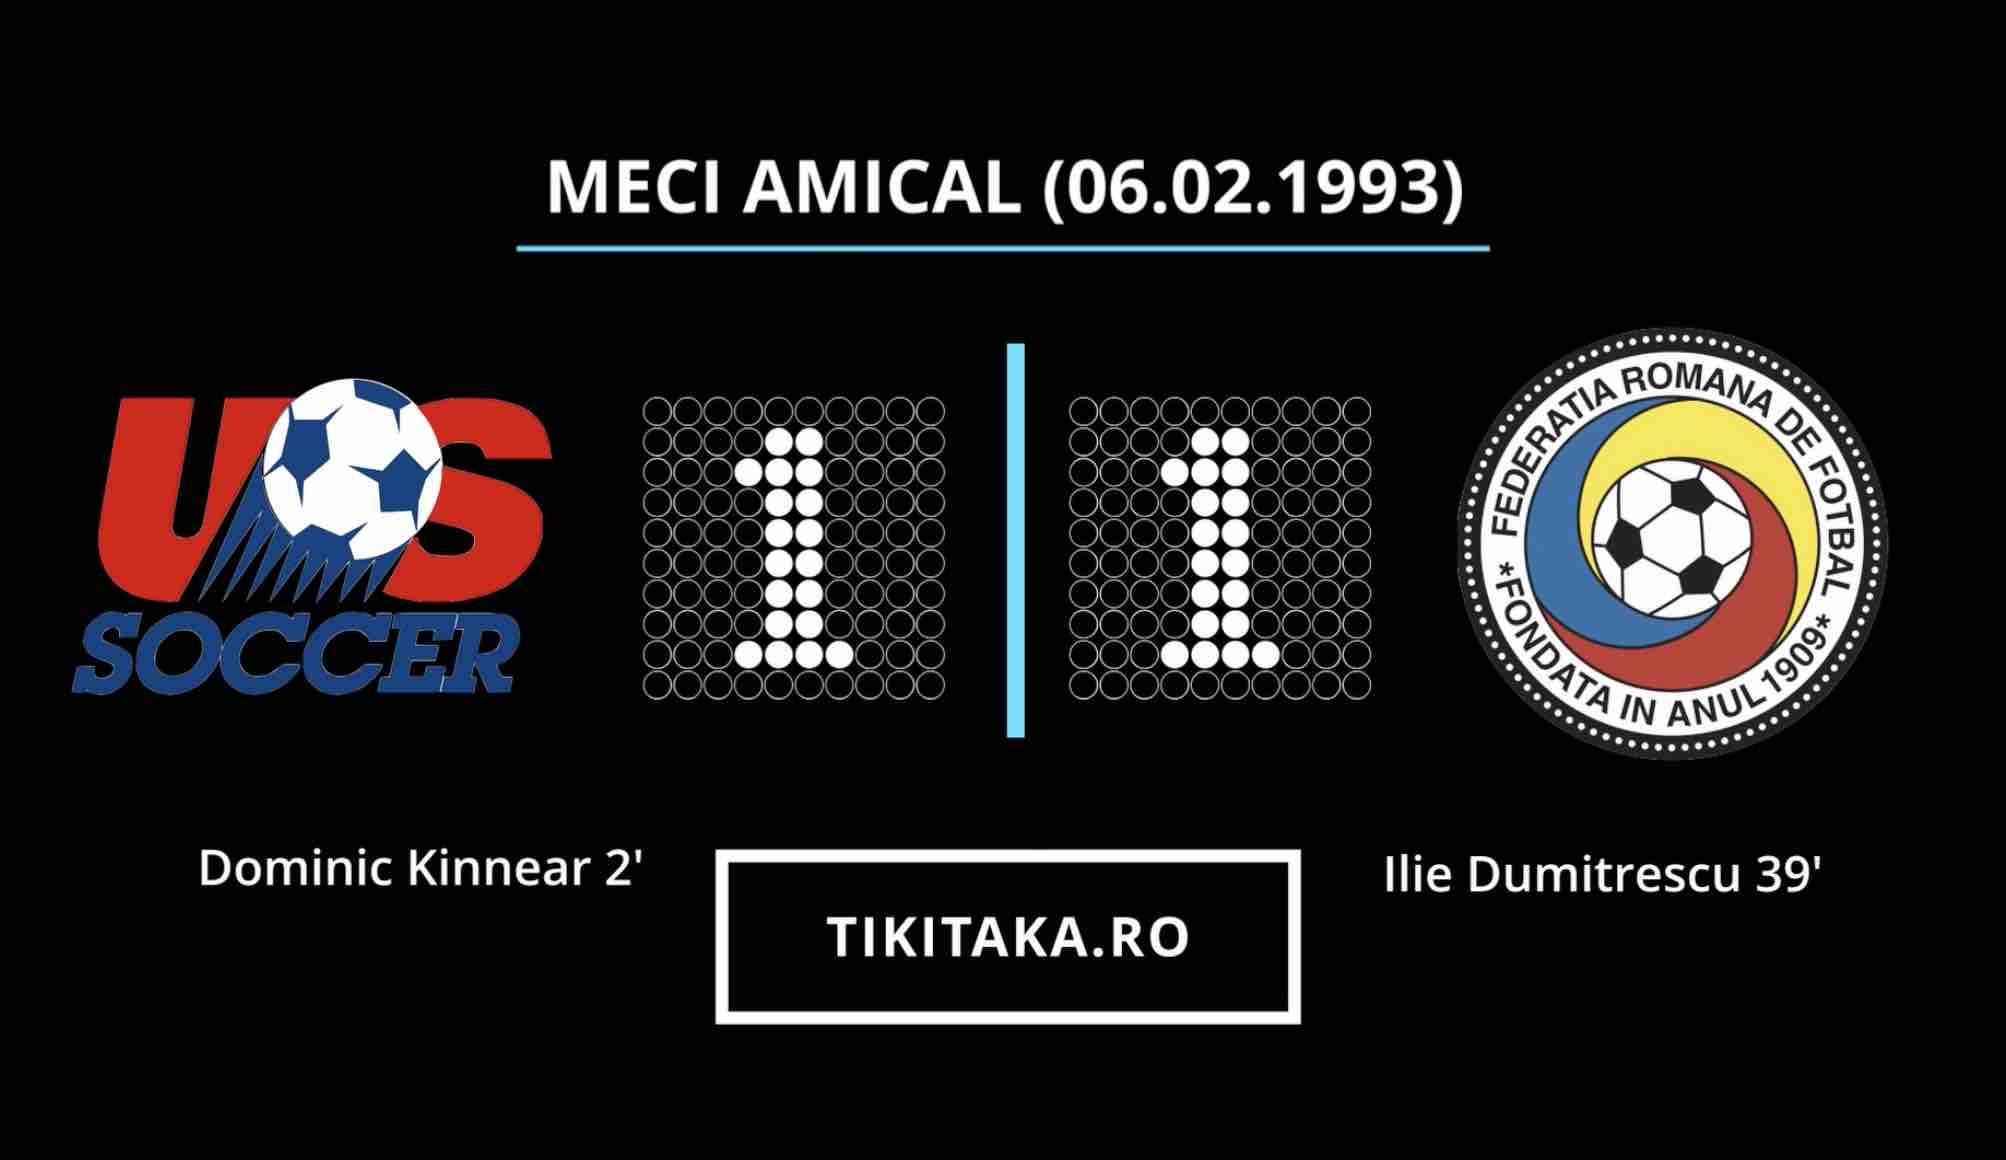 SUA ROMANIA 1993